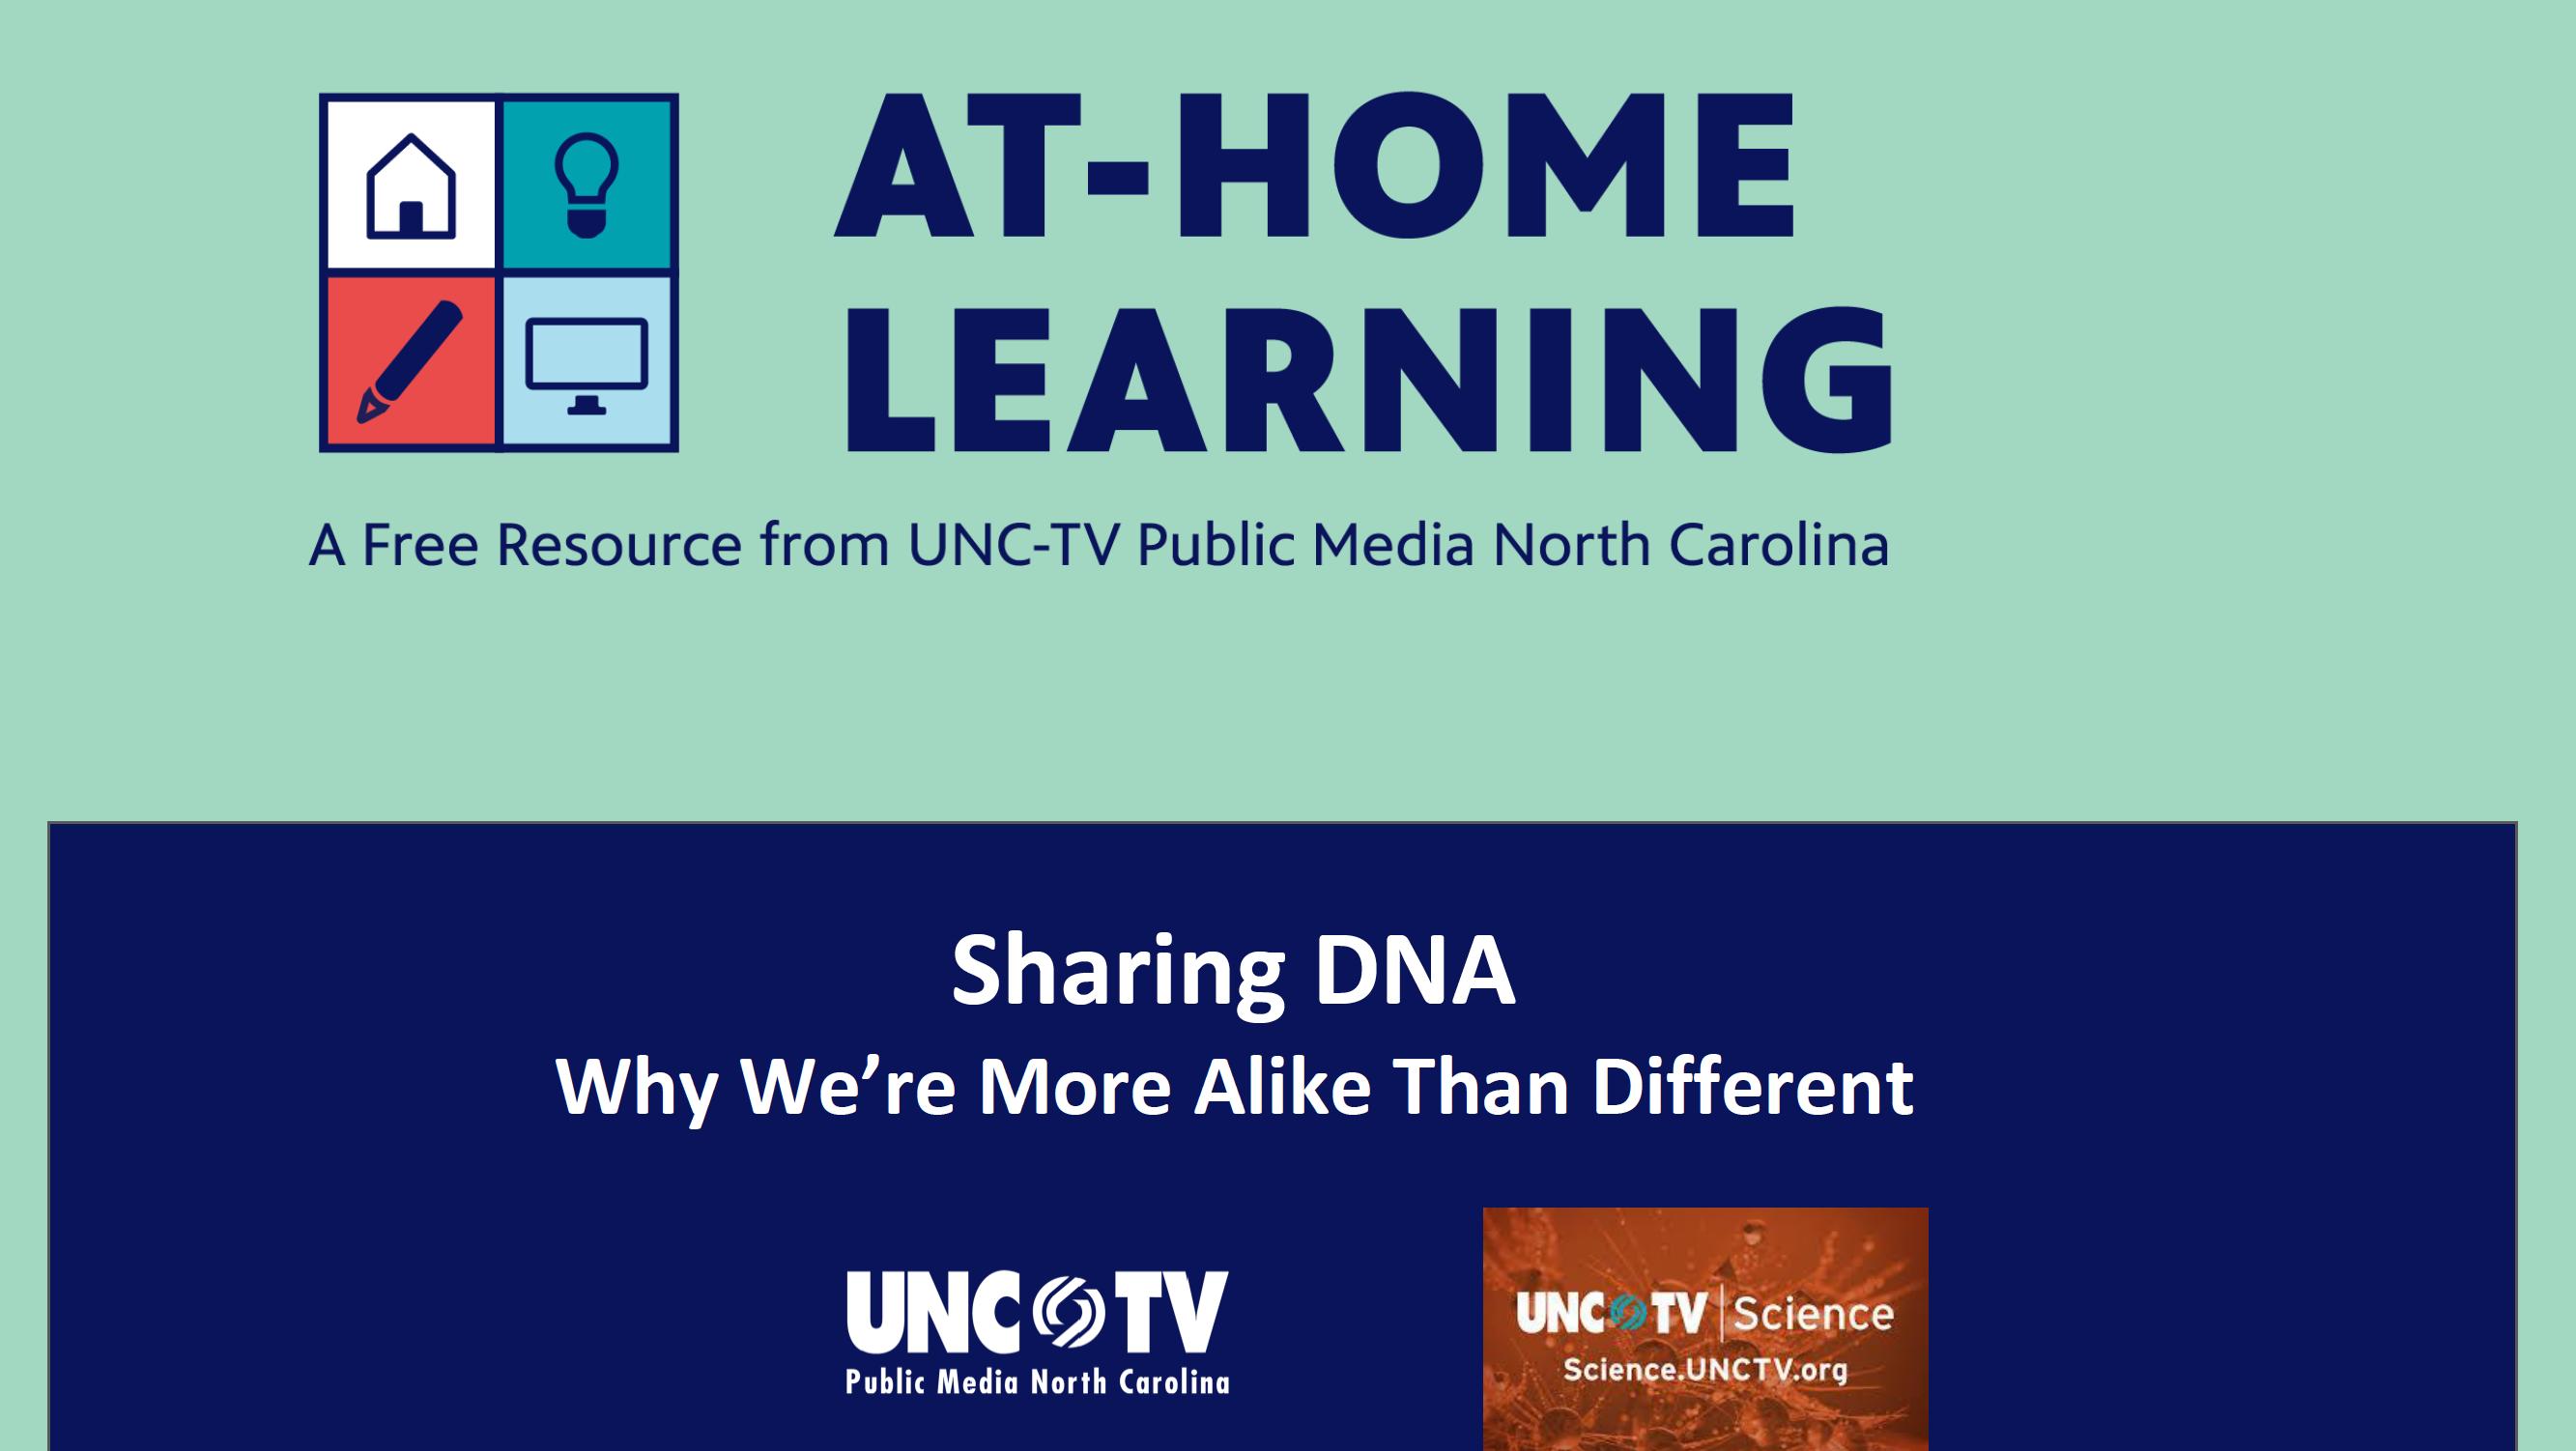 AHL Webinar: Sharing DNA (featuring UNC-TV Science